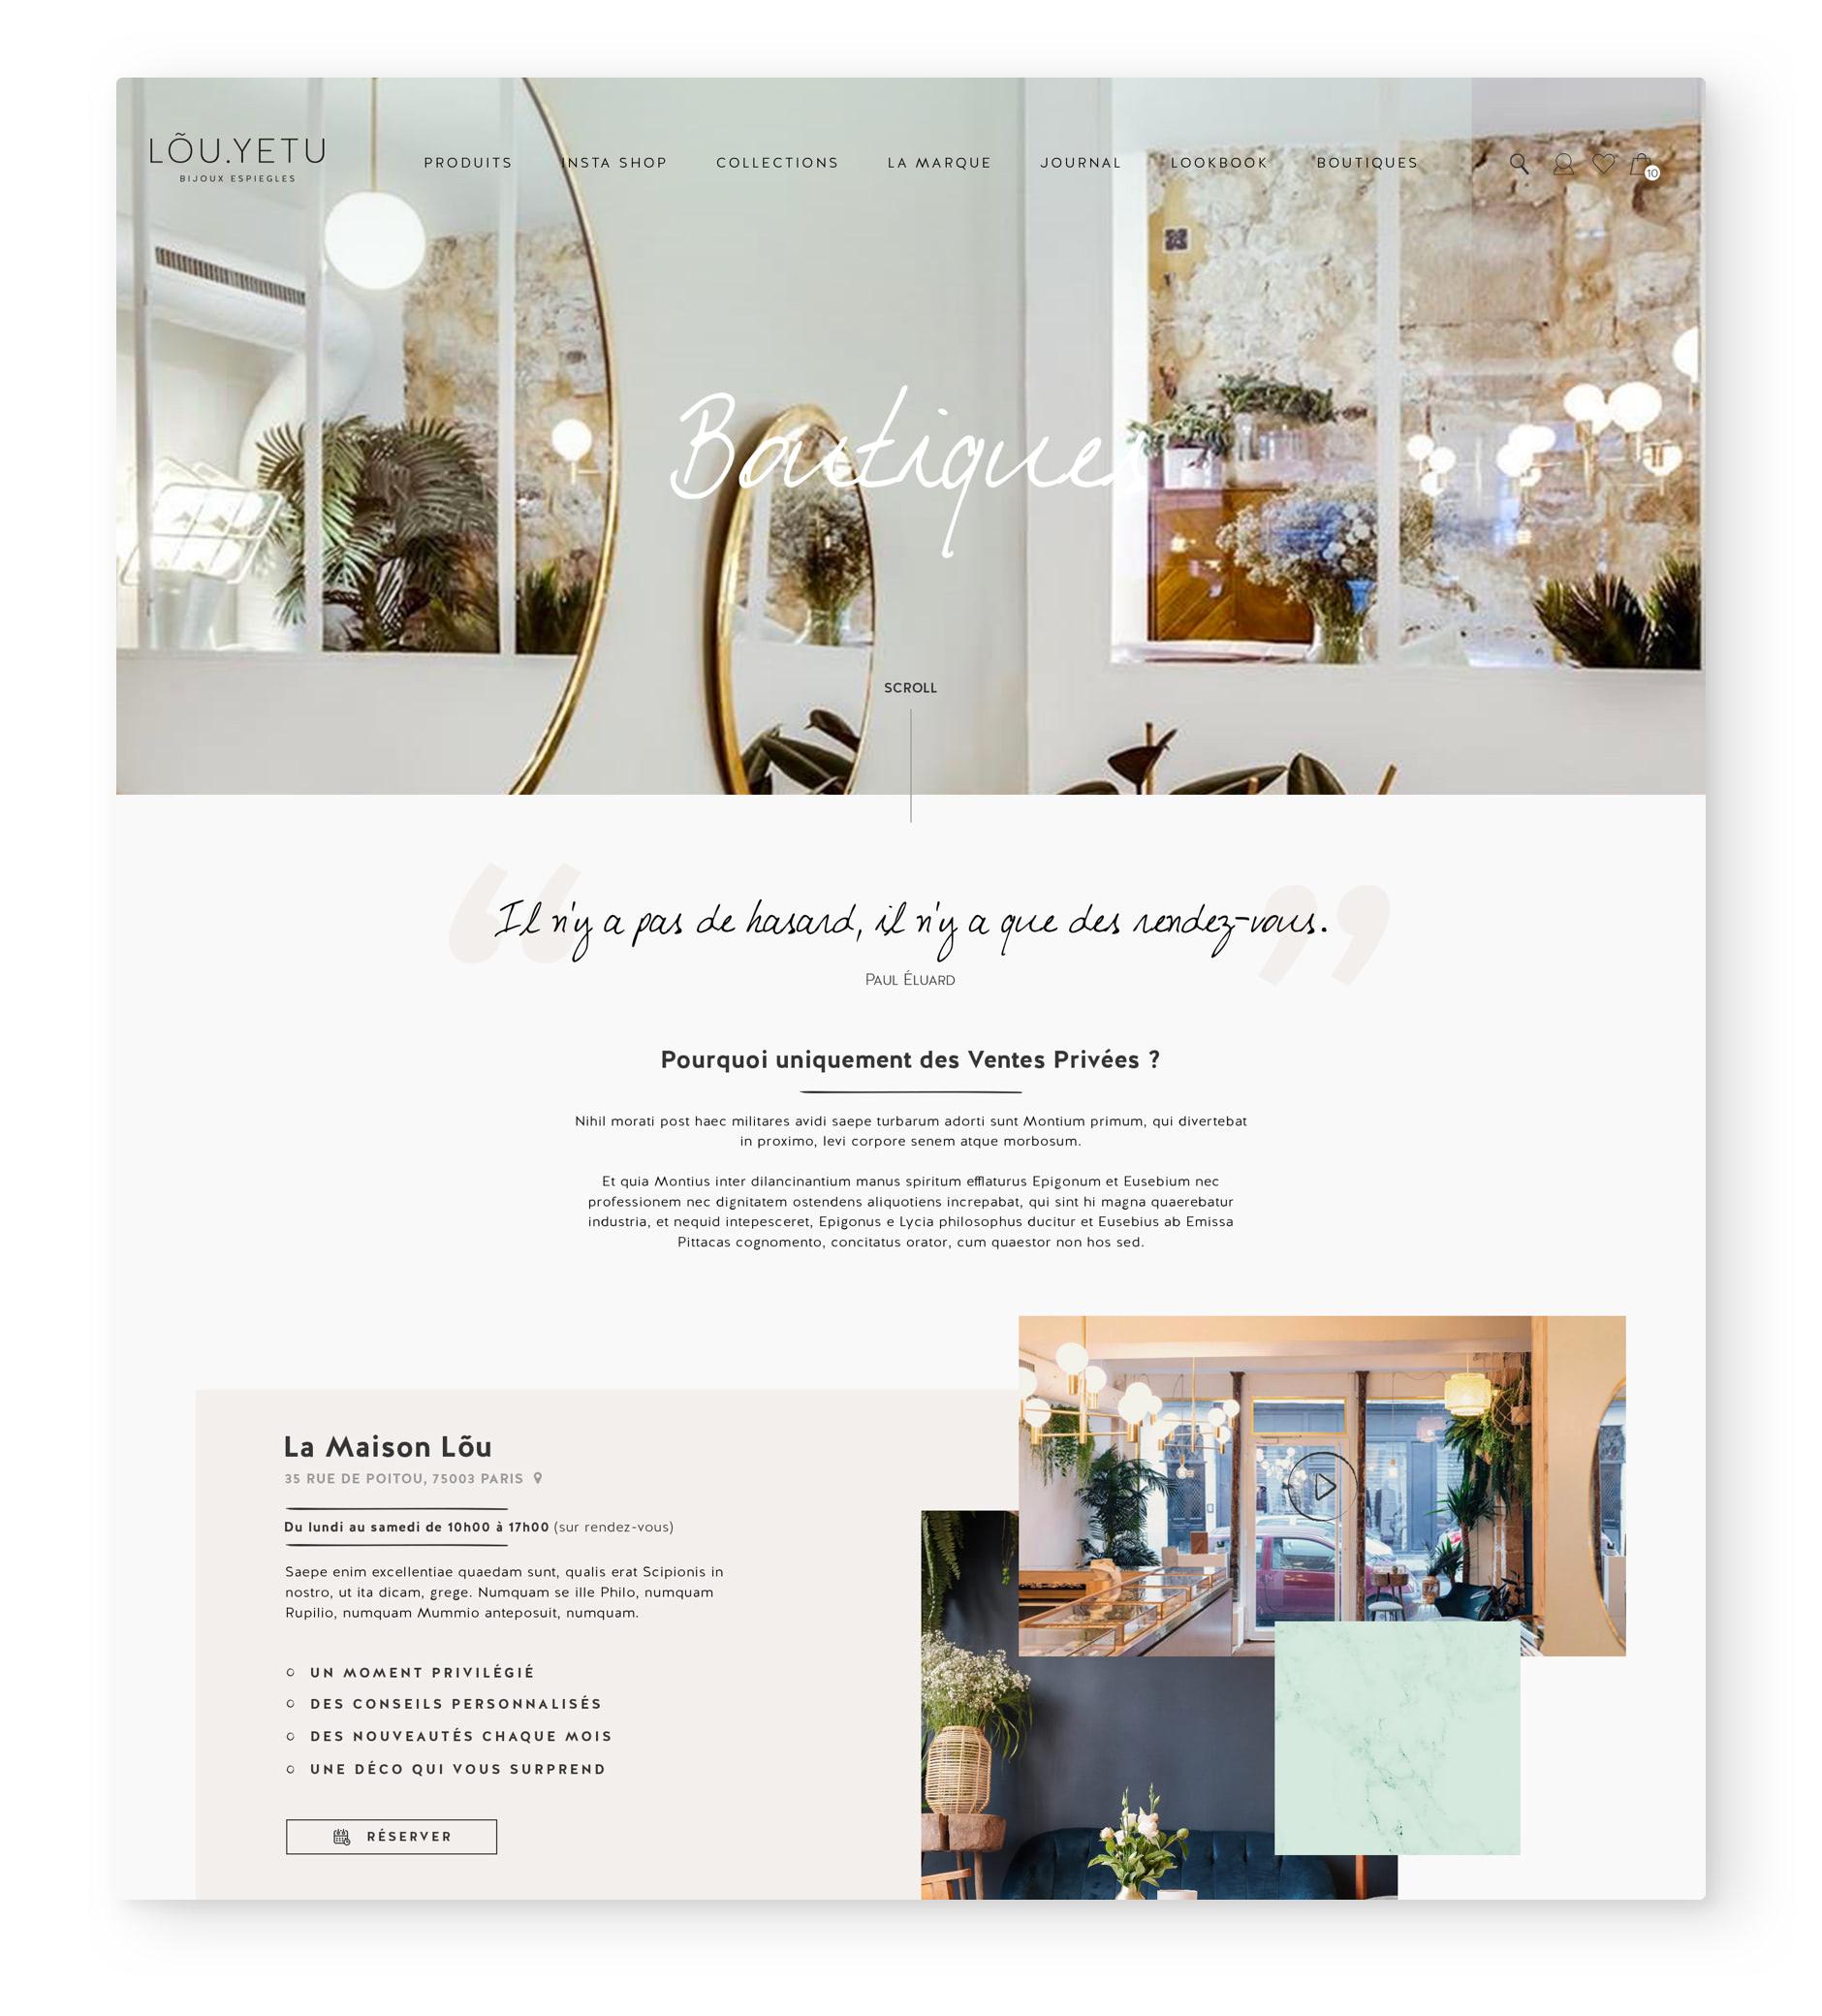 projet-lou_yetu-bijoux-website_design-robin_p_03@2x